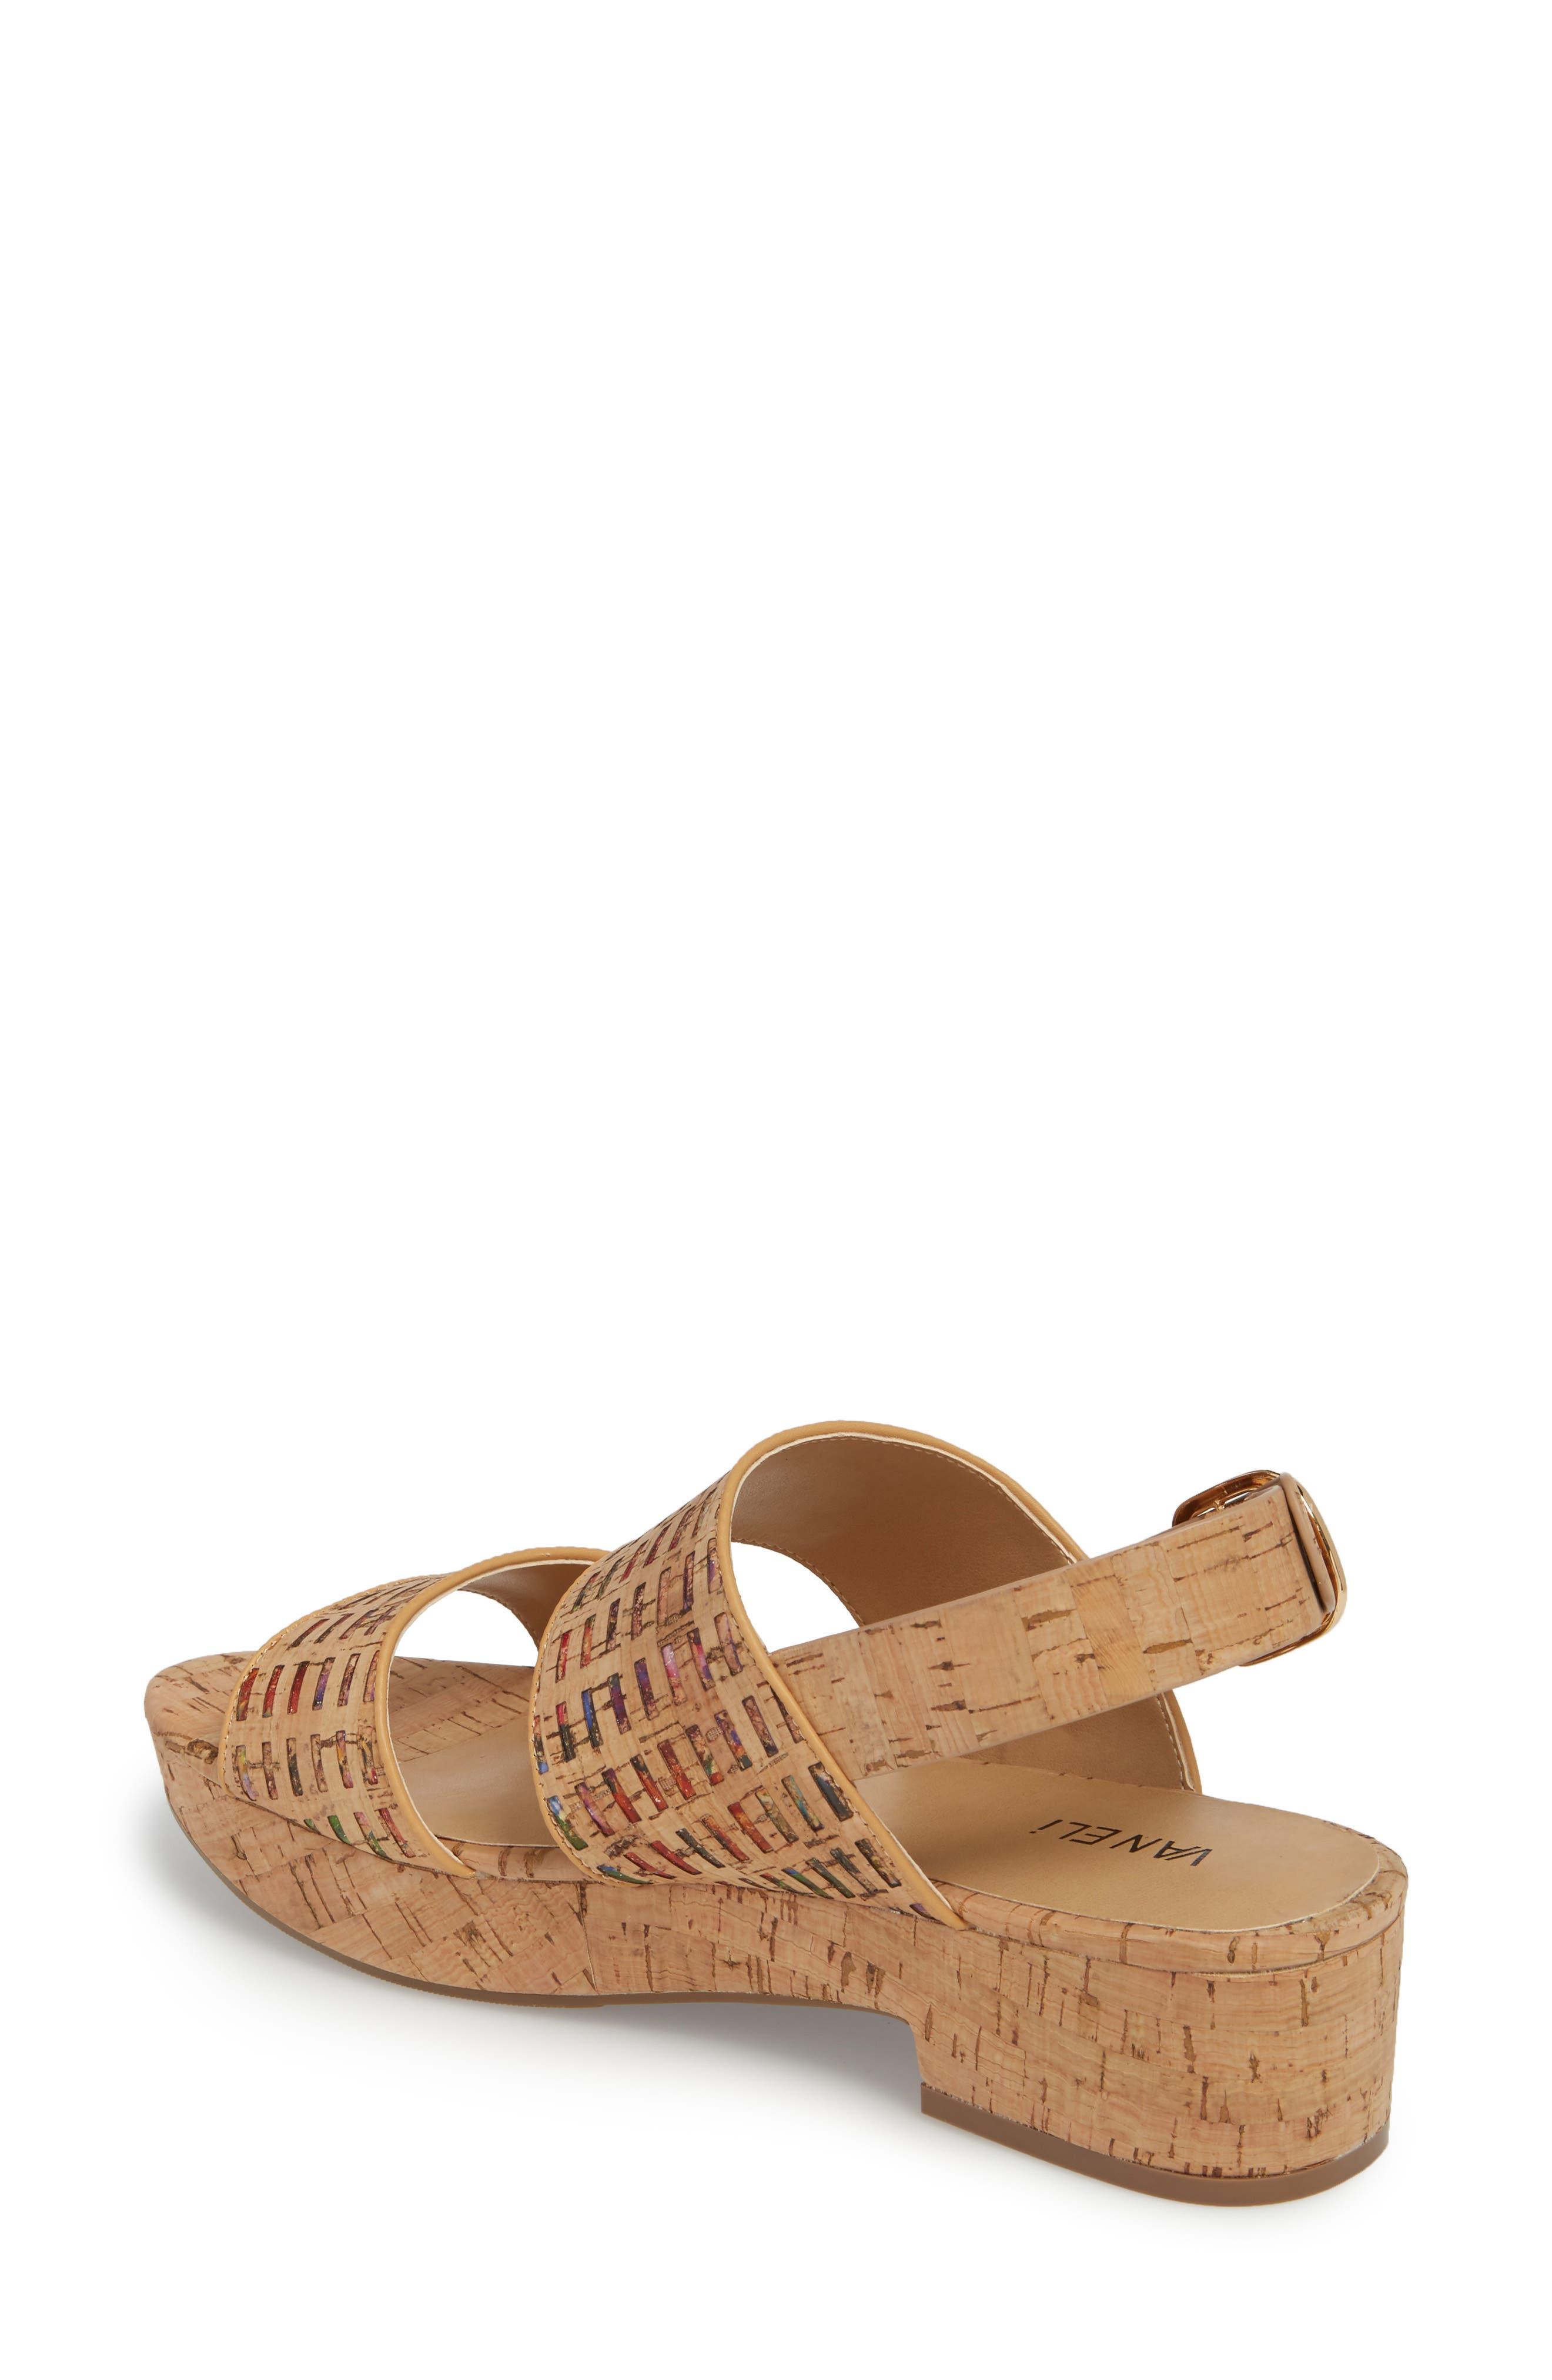 Safty Slingback Sandal,                             Alternate thumbnail 4, color,